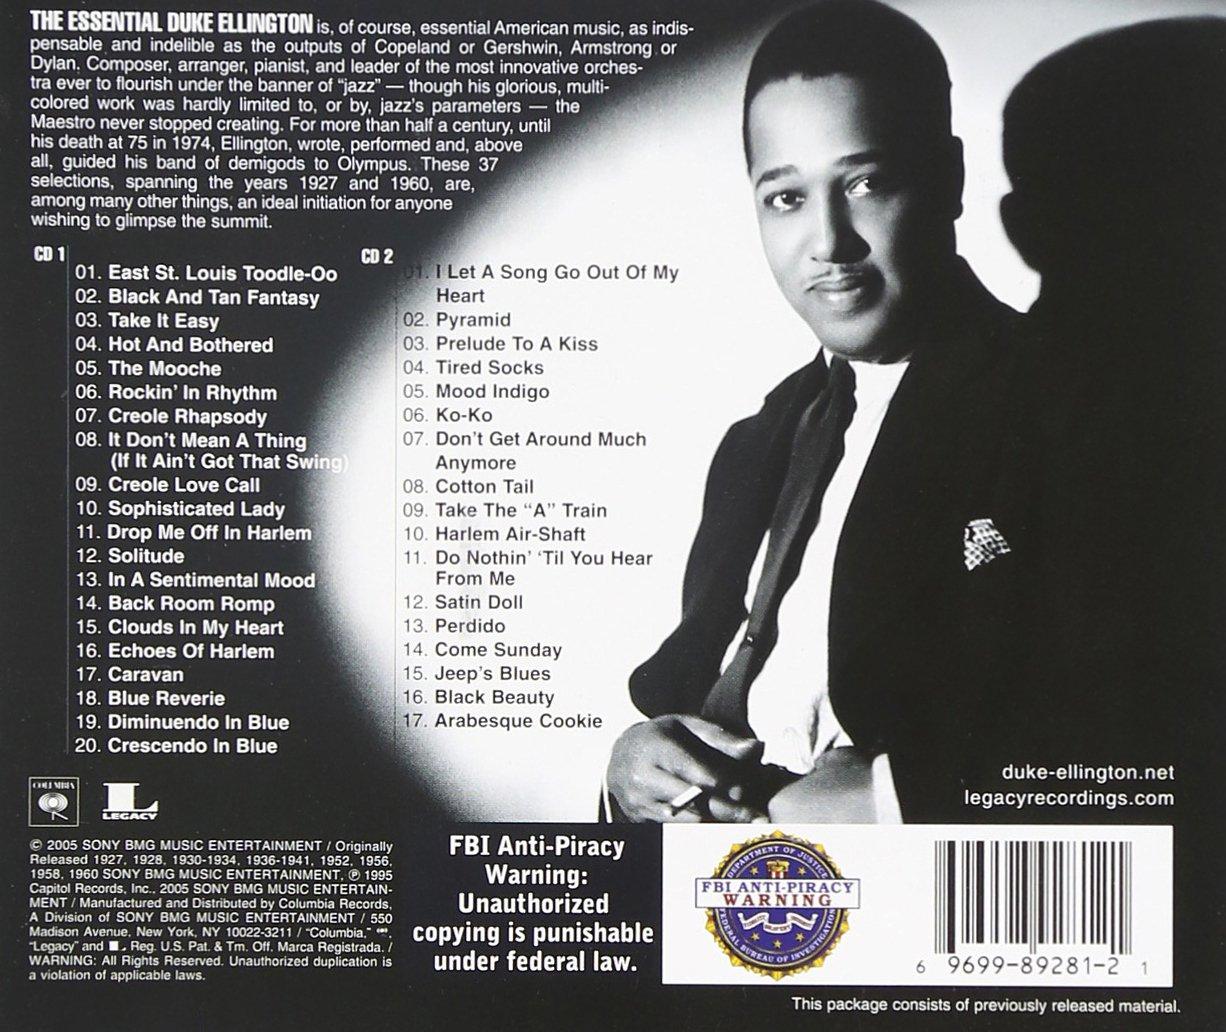 The Essential Duke Ellington